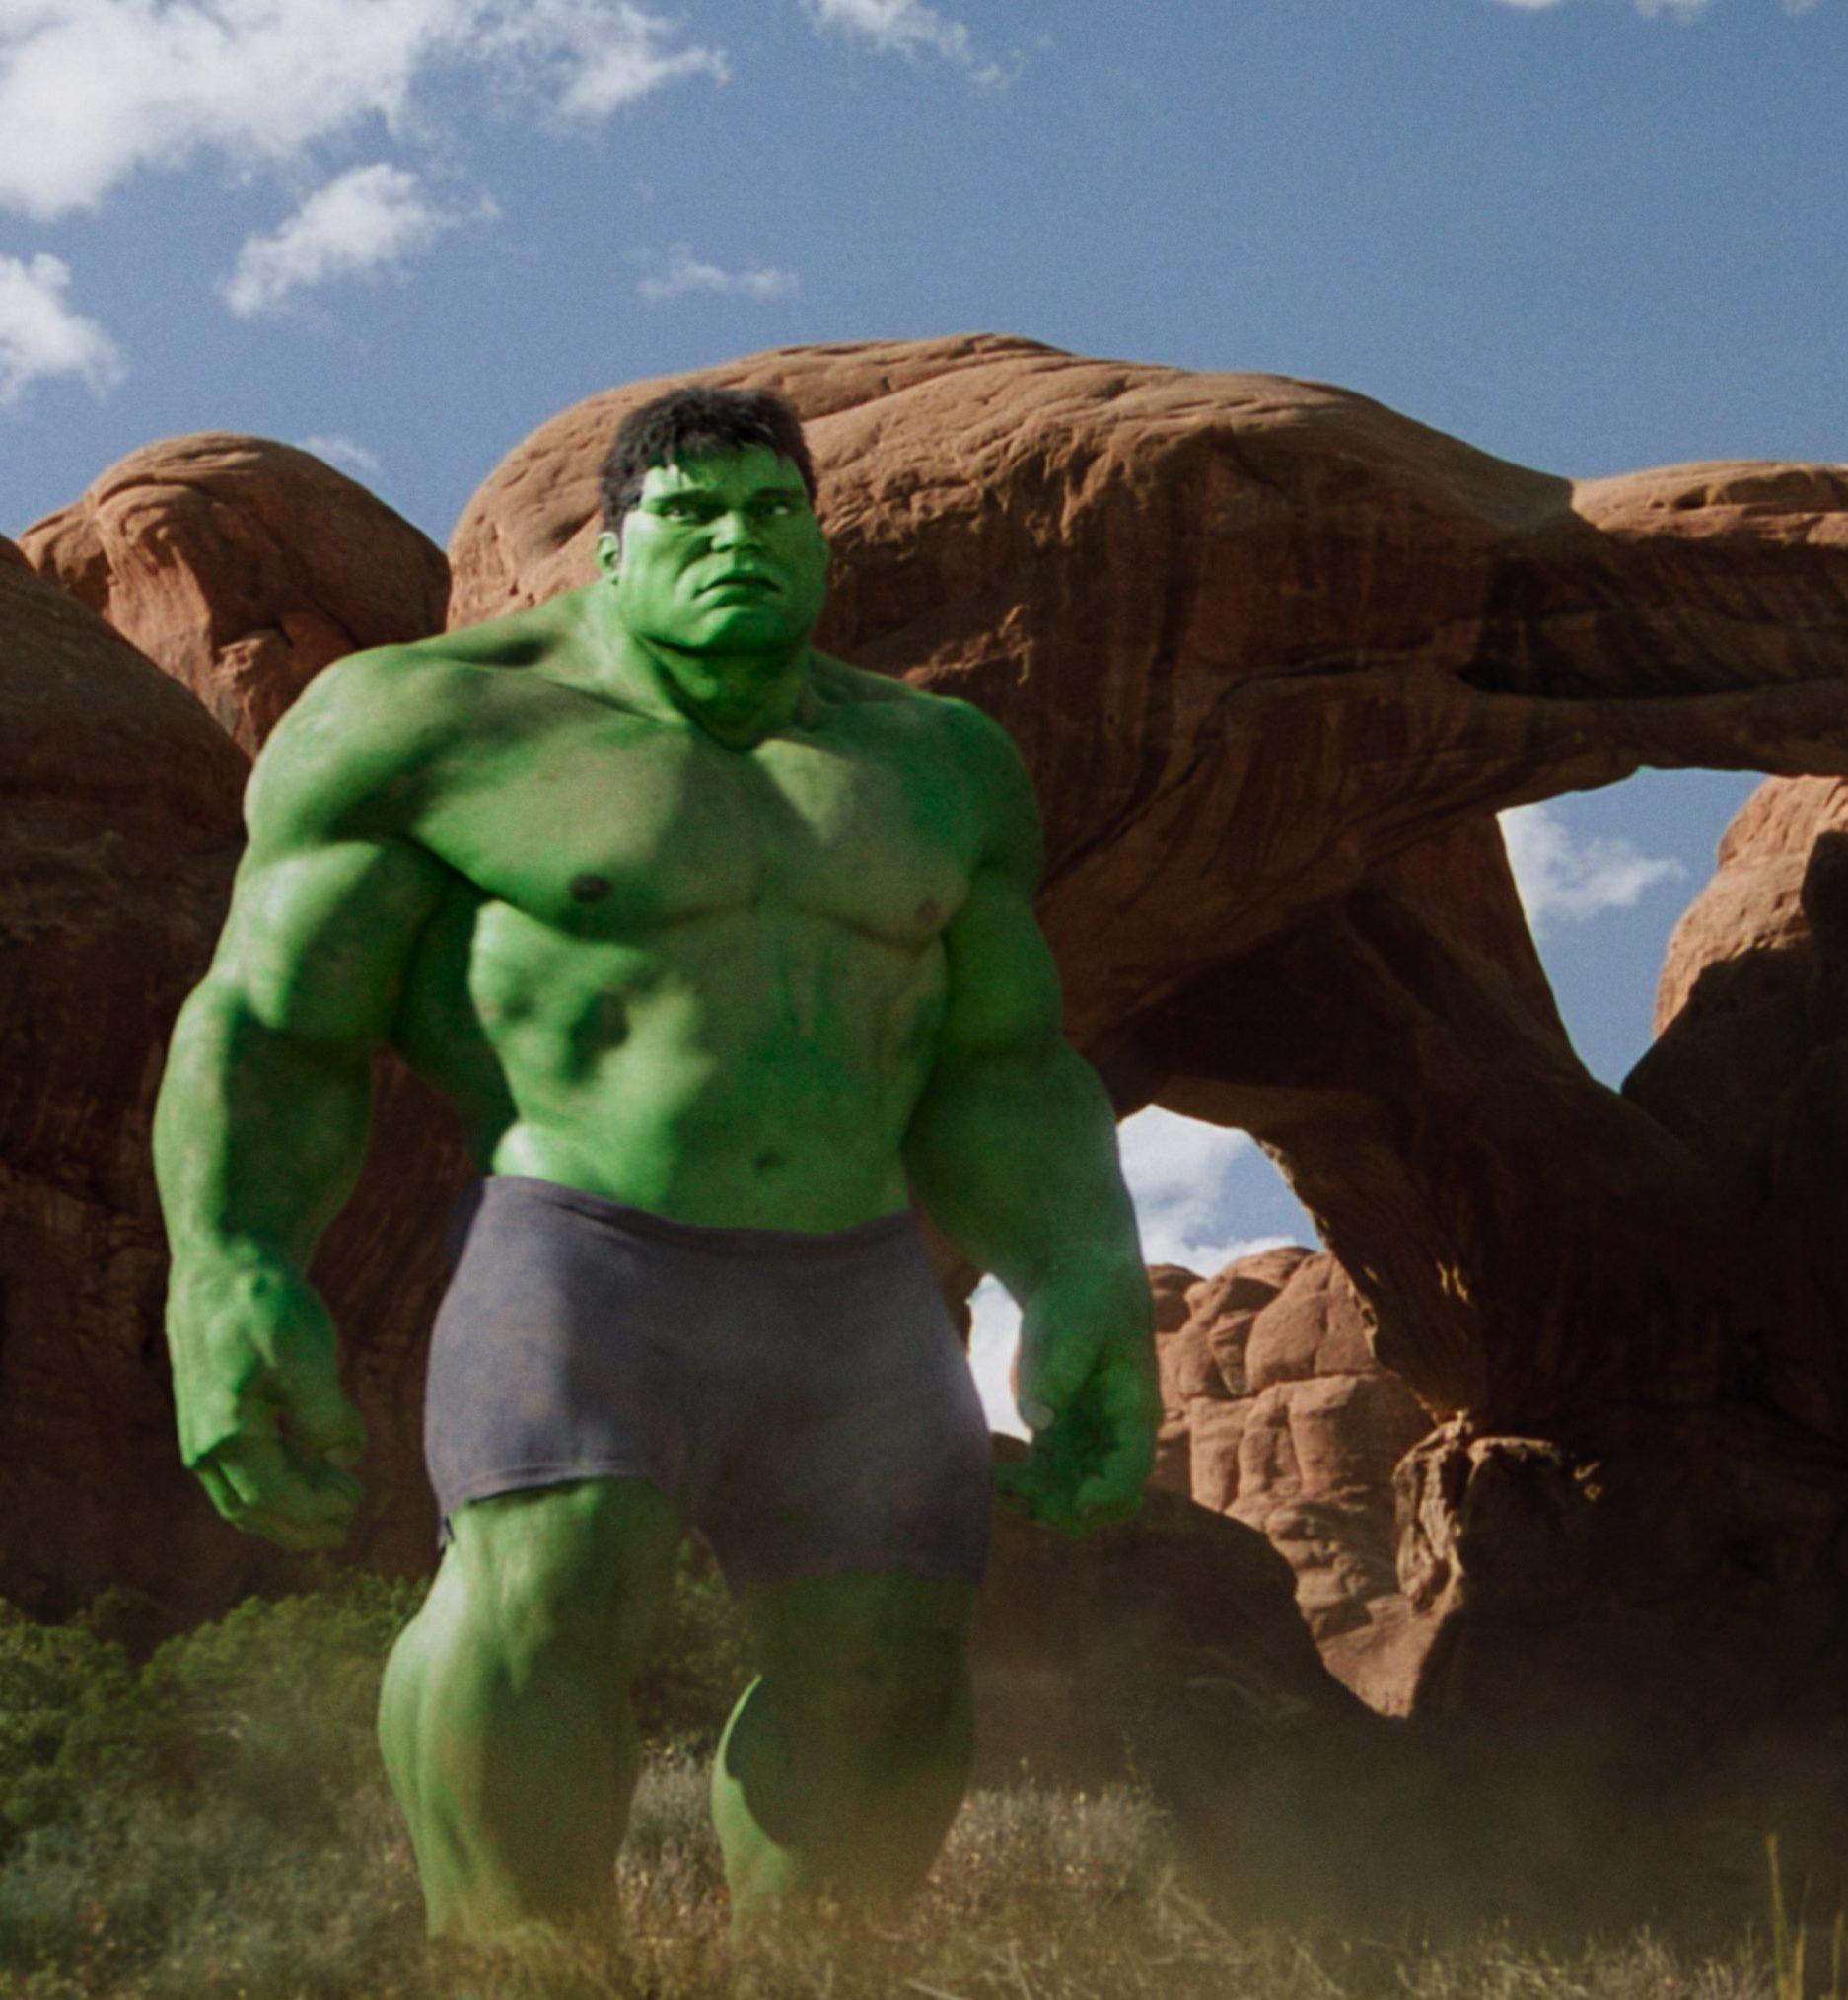 Hulk.mkv snapshot 01.41.51 2019.08.03 21.16.42 e1580825913160 20 CGI Moments So Bad They Ruined The Entire Film